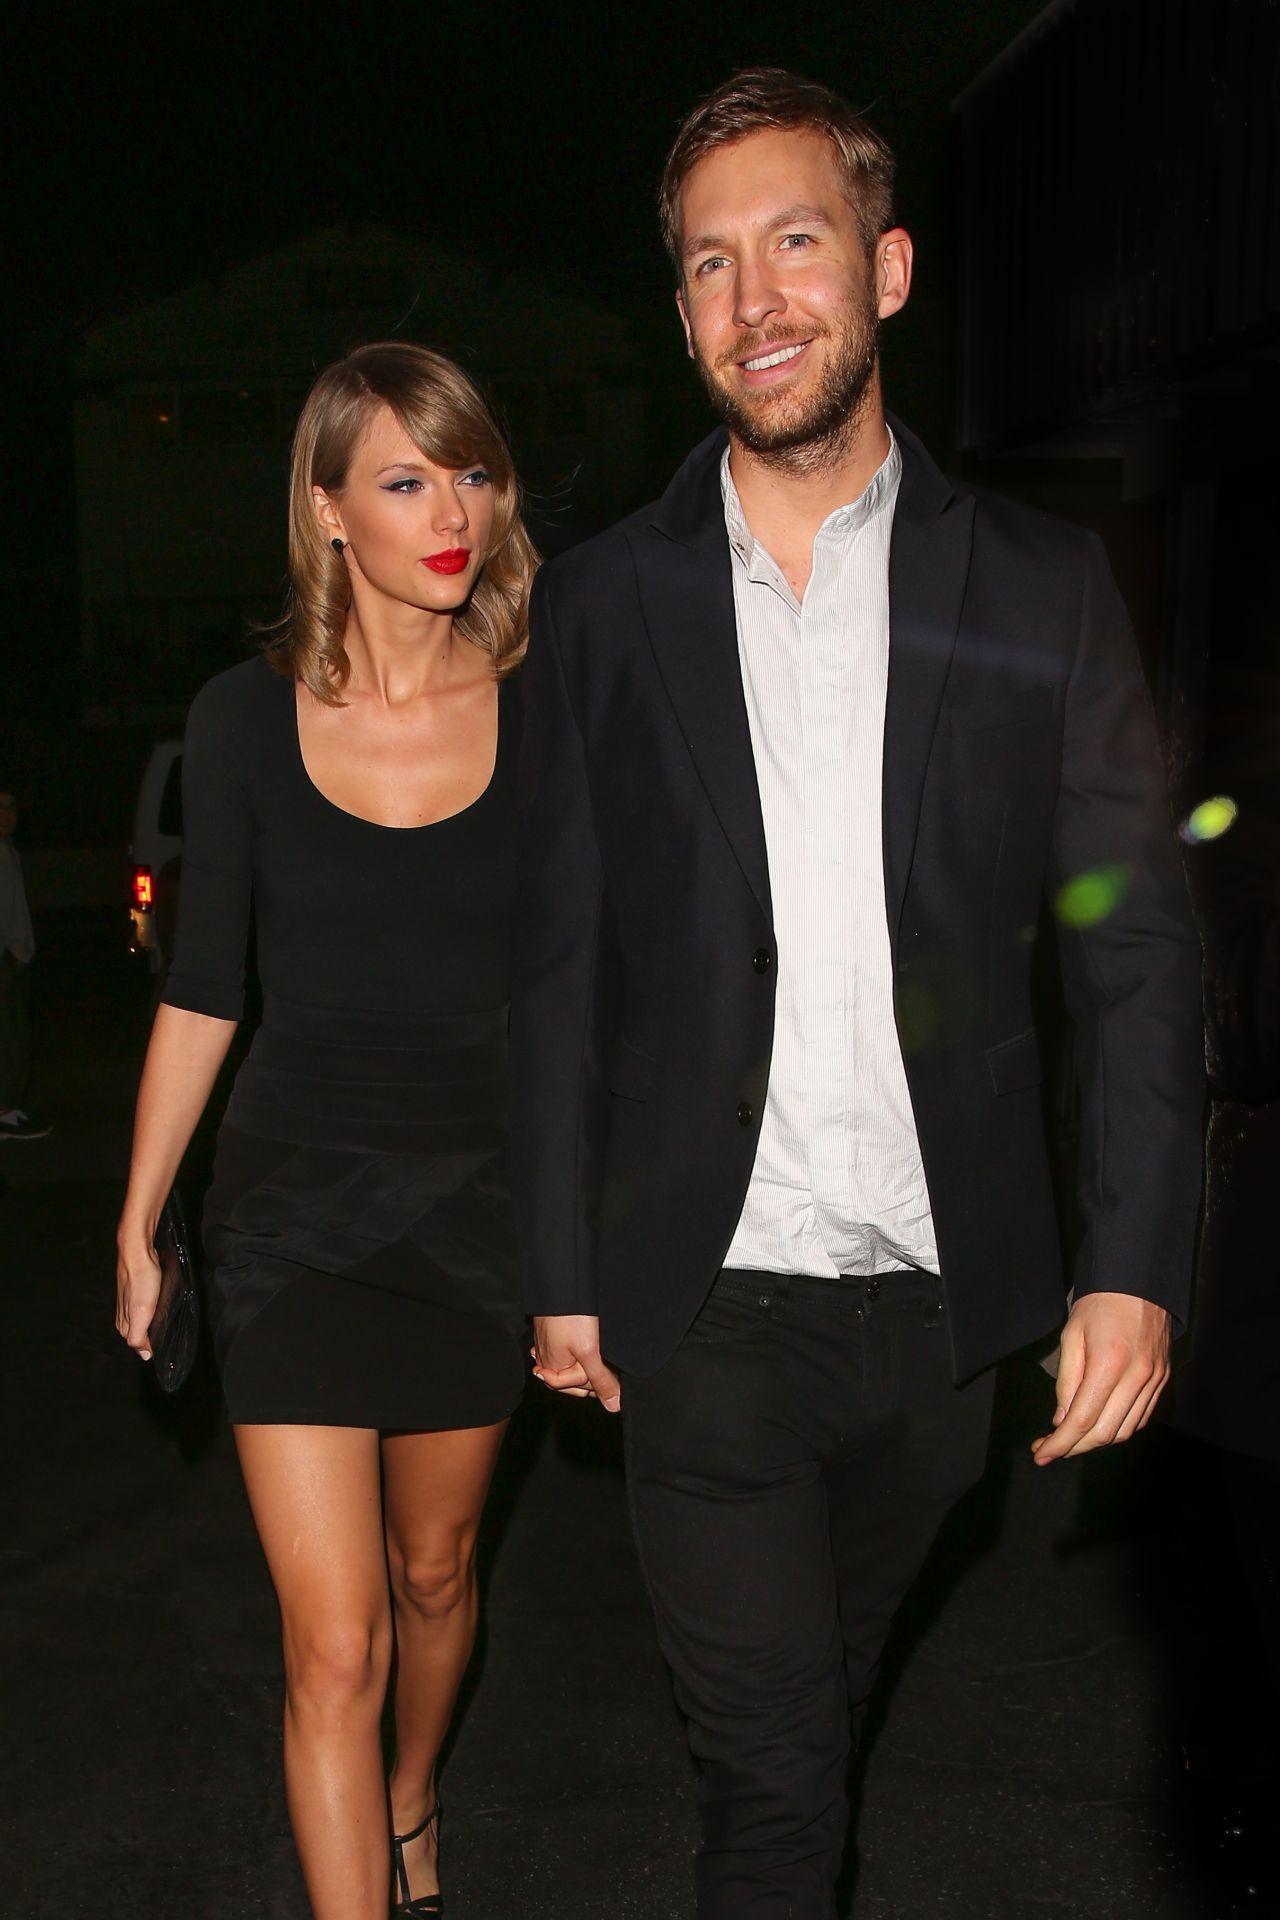 Taylor Swift with Calvin Harris - Leaving Gjelina Restaurant in Venice, CA, May 2015